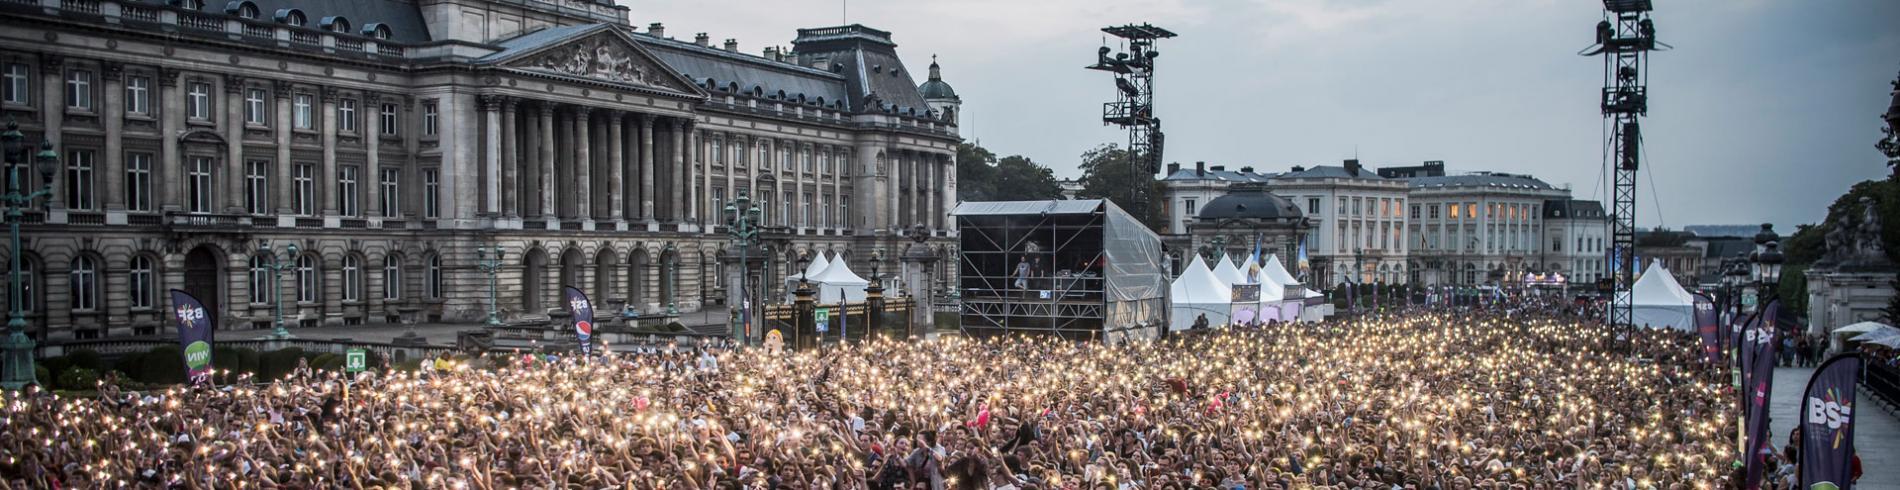 Music festival in Brussels